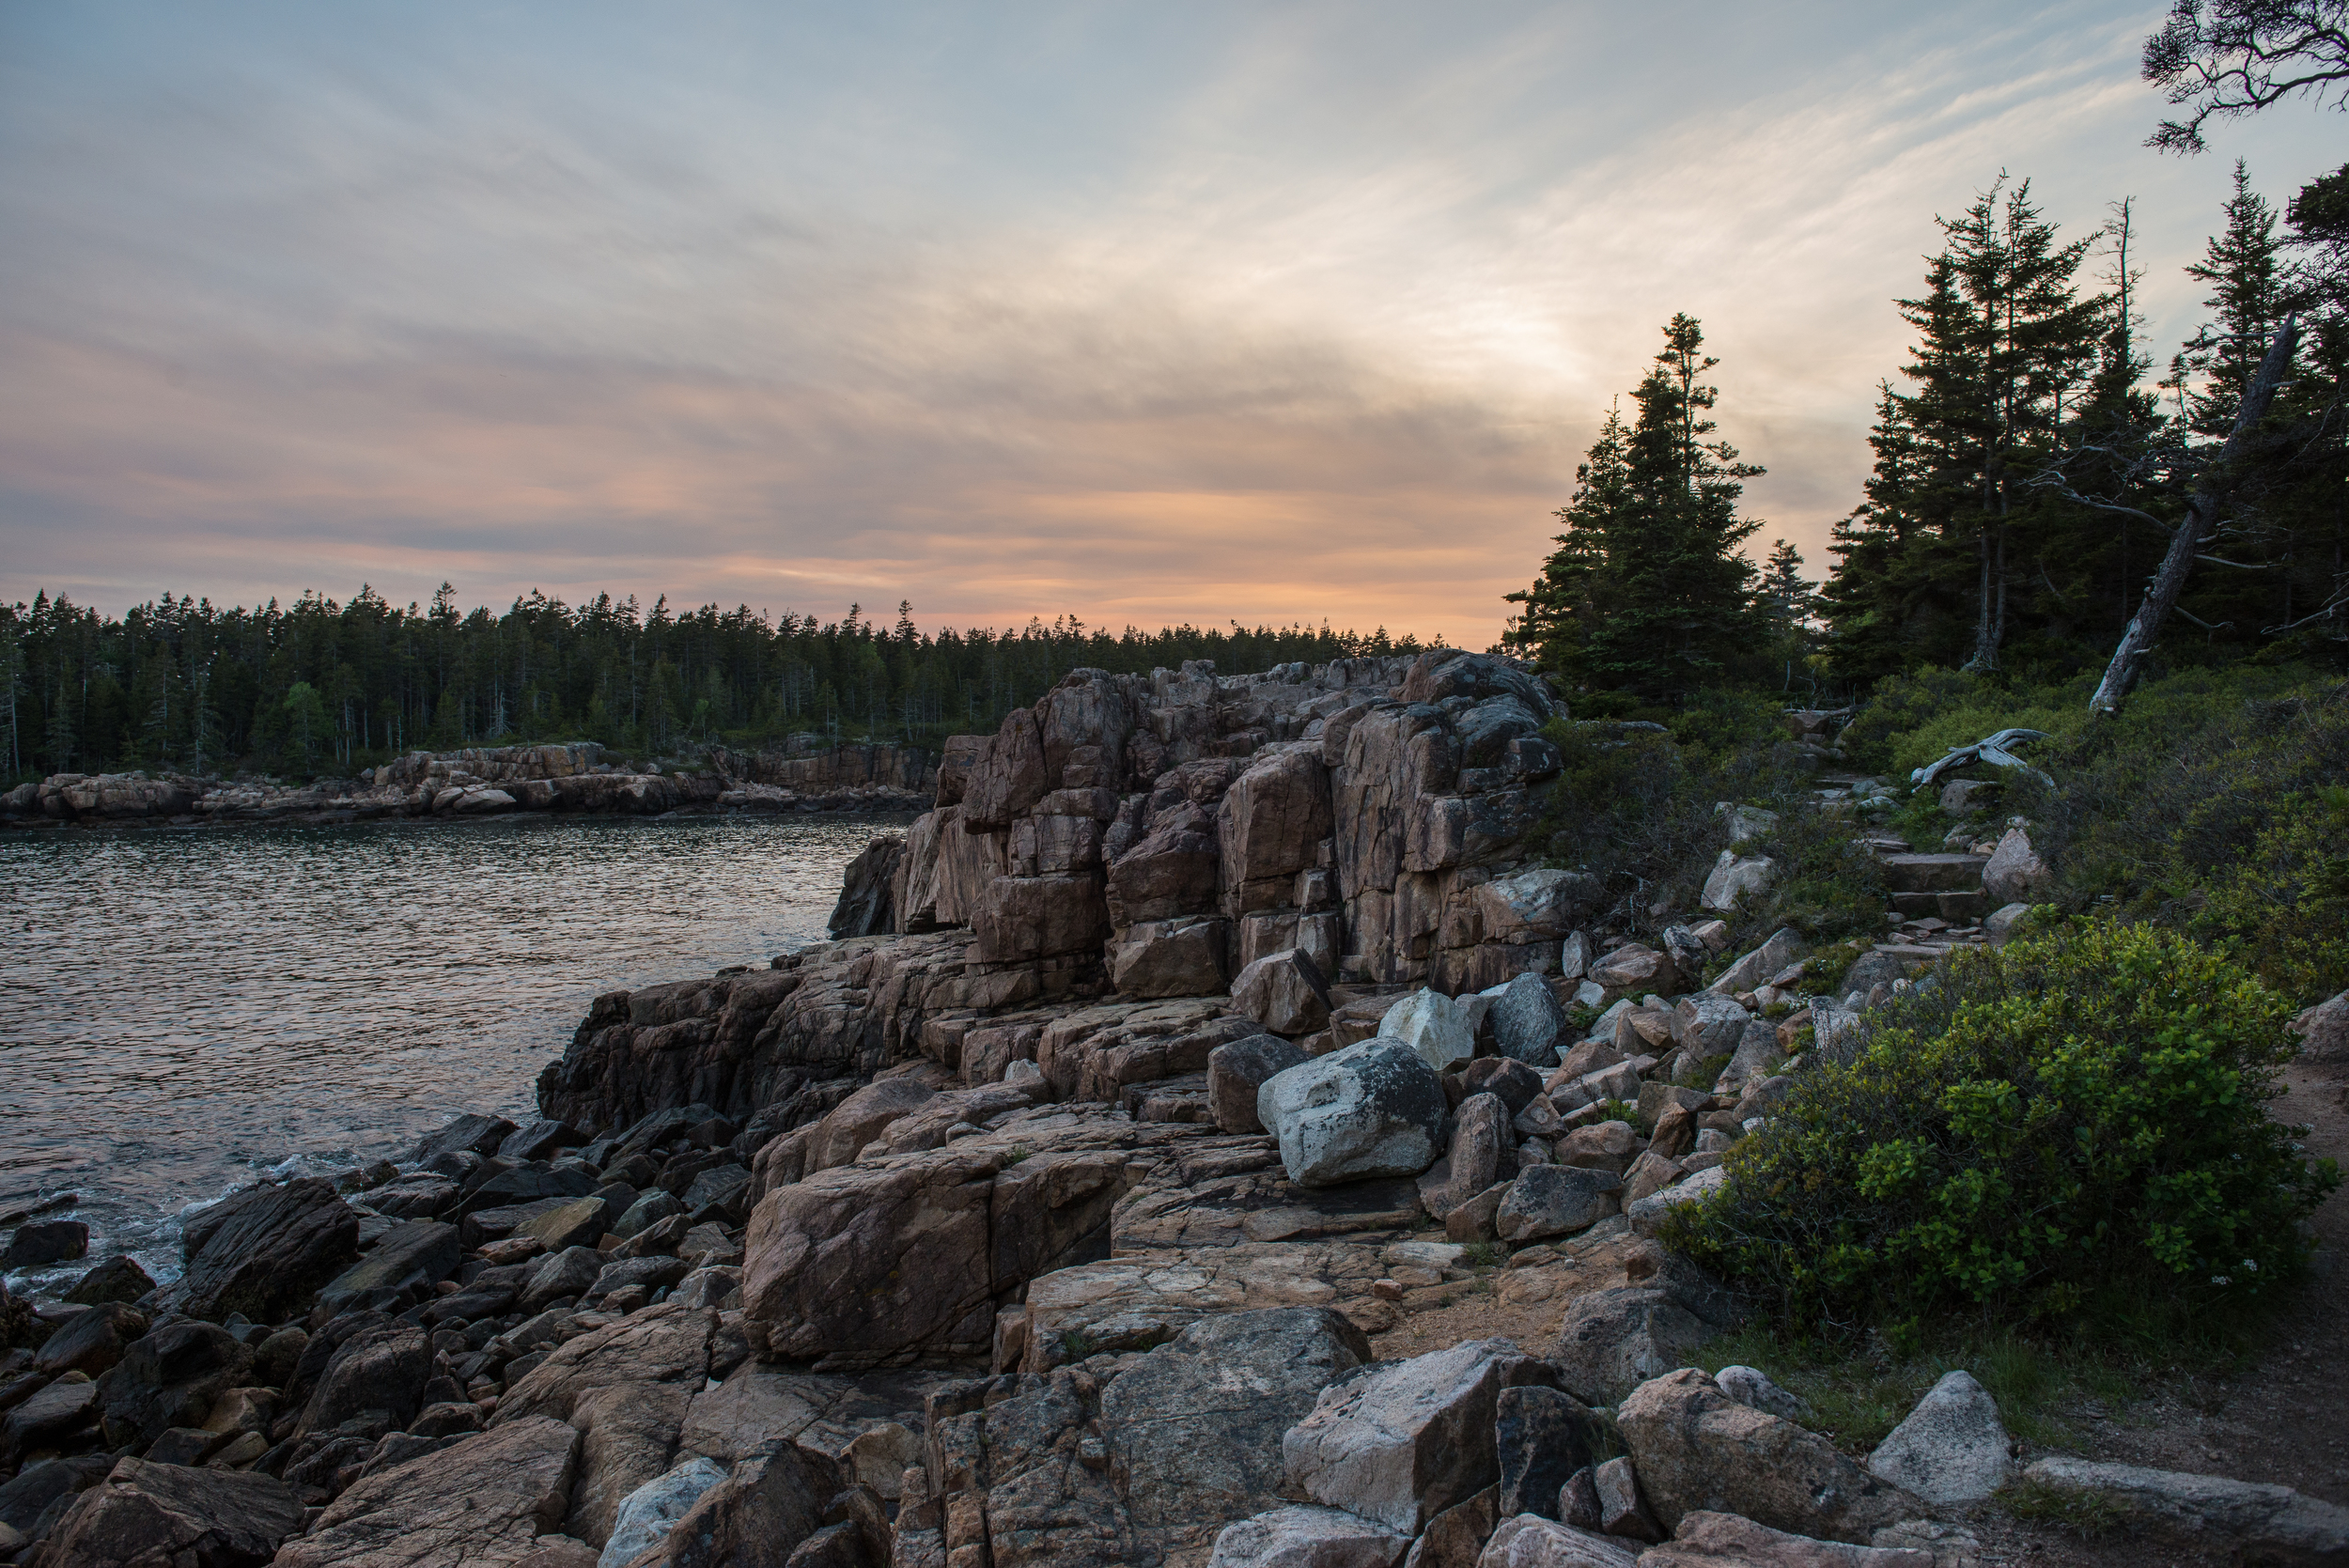 Acadia National Park, Mt. Desert Isle, Maine. 2015